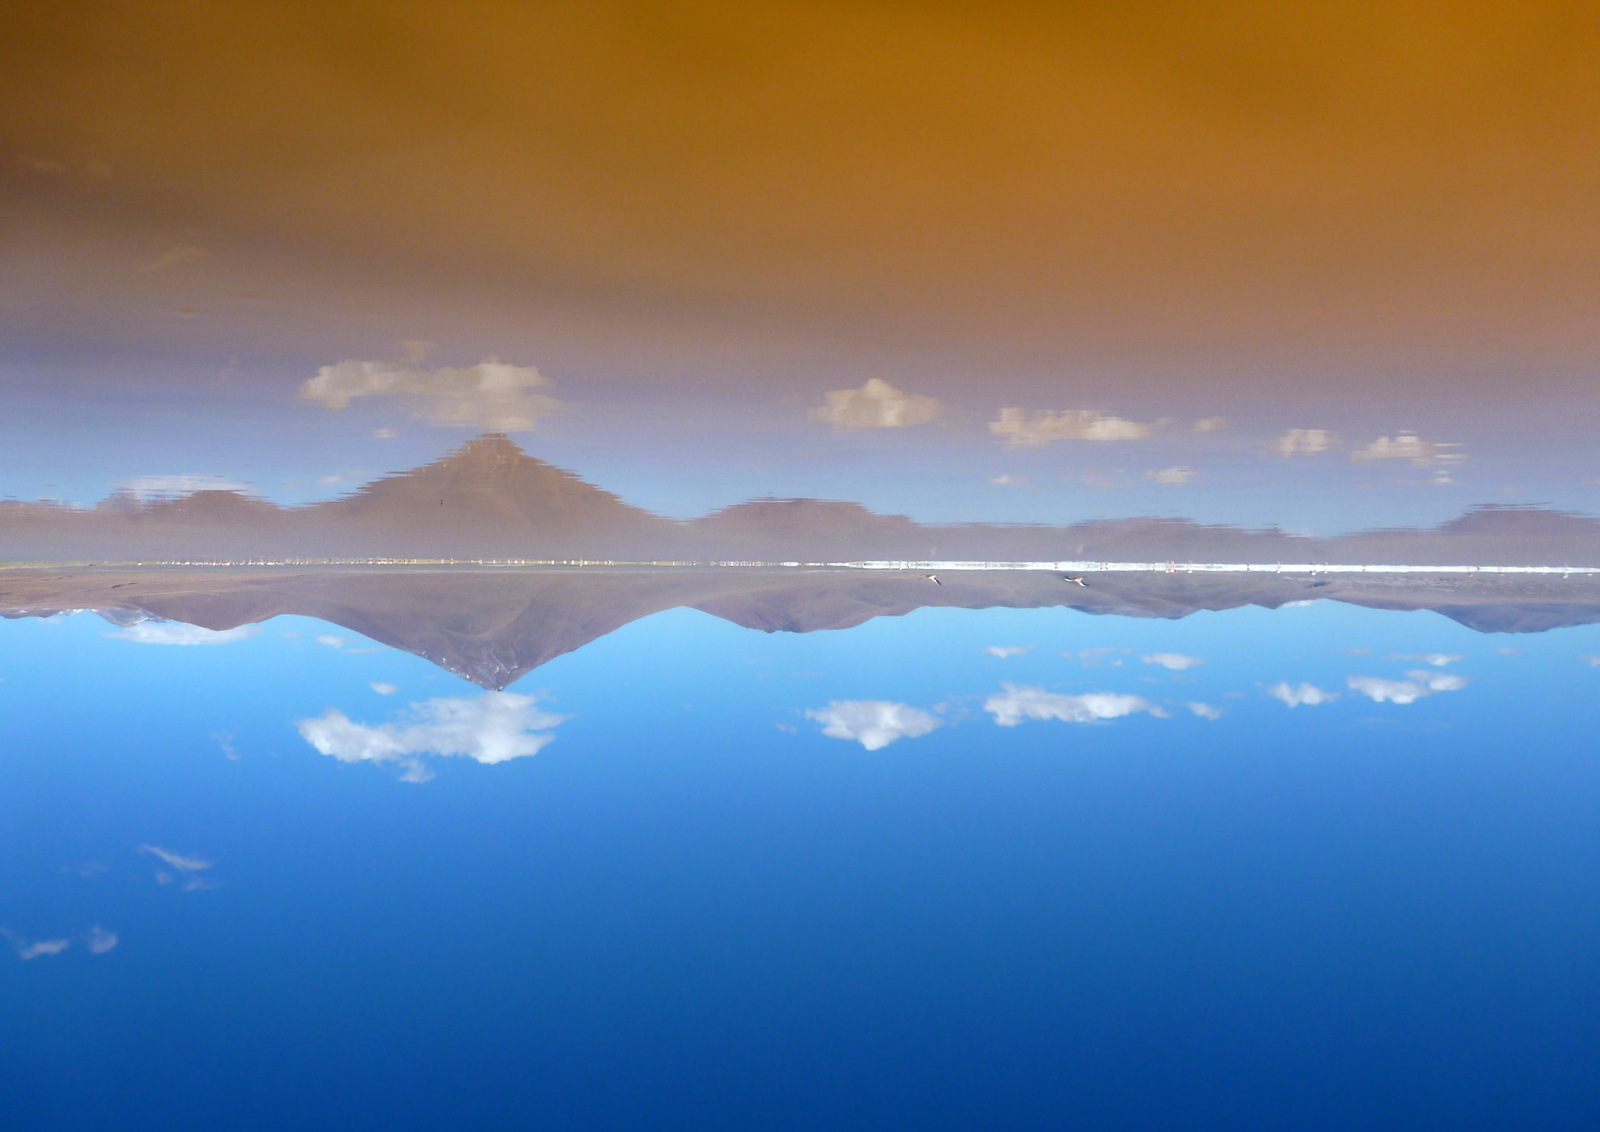 reflets du volcan Pabellon